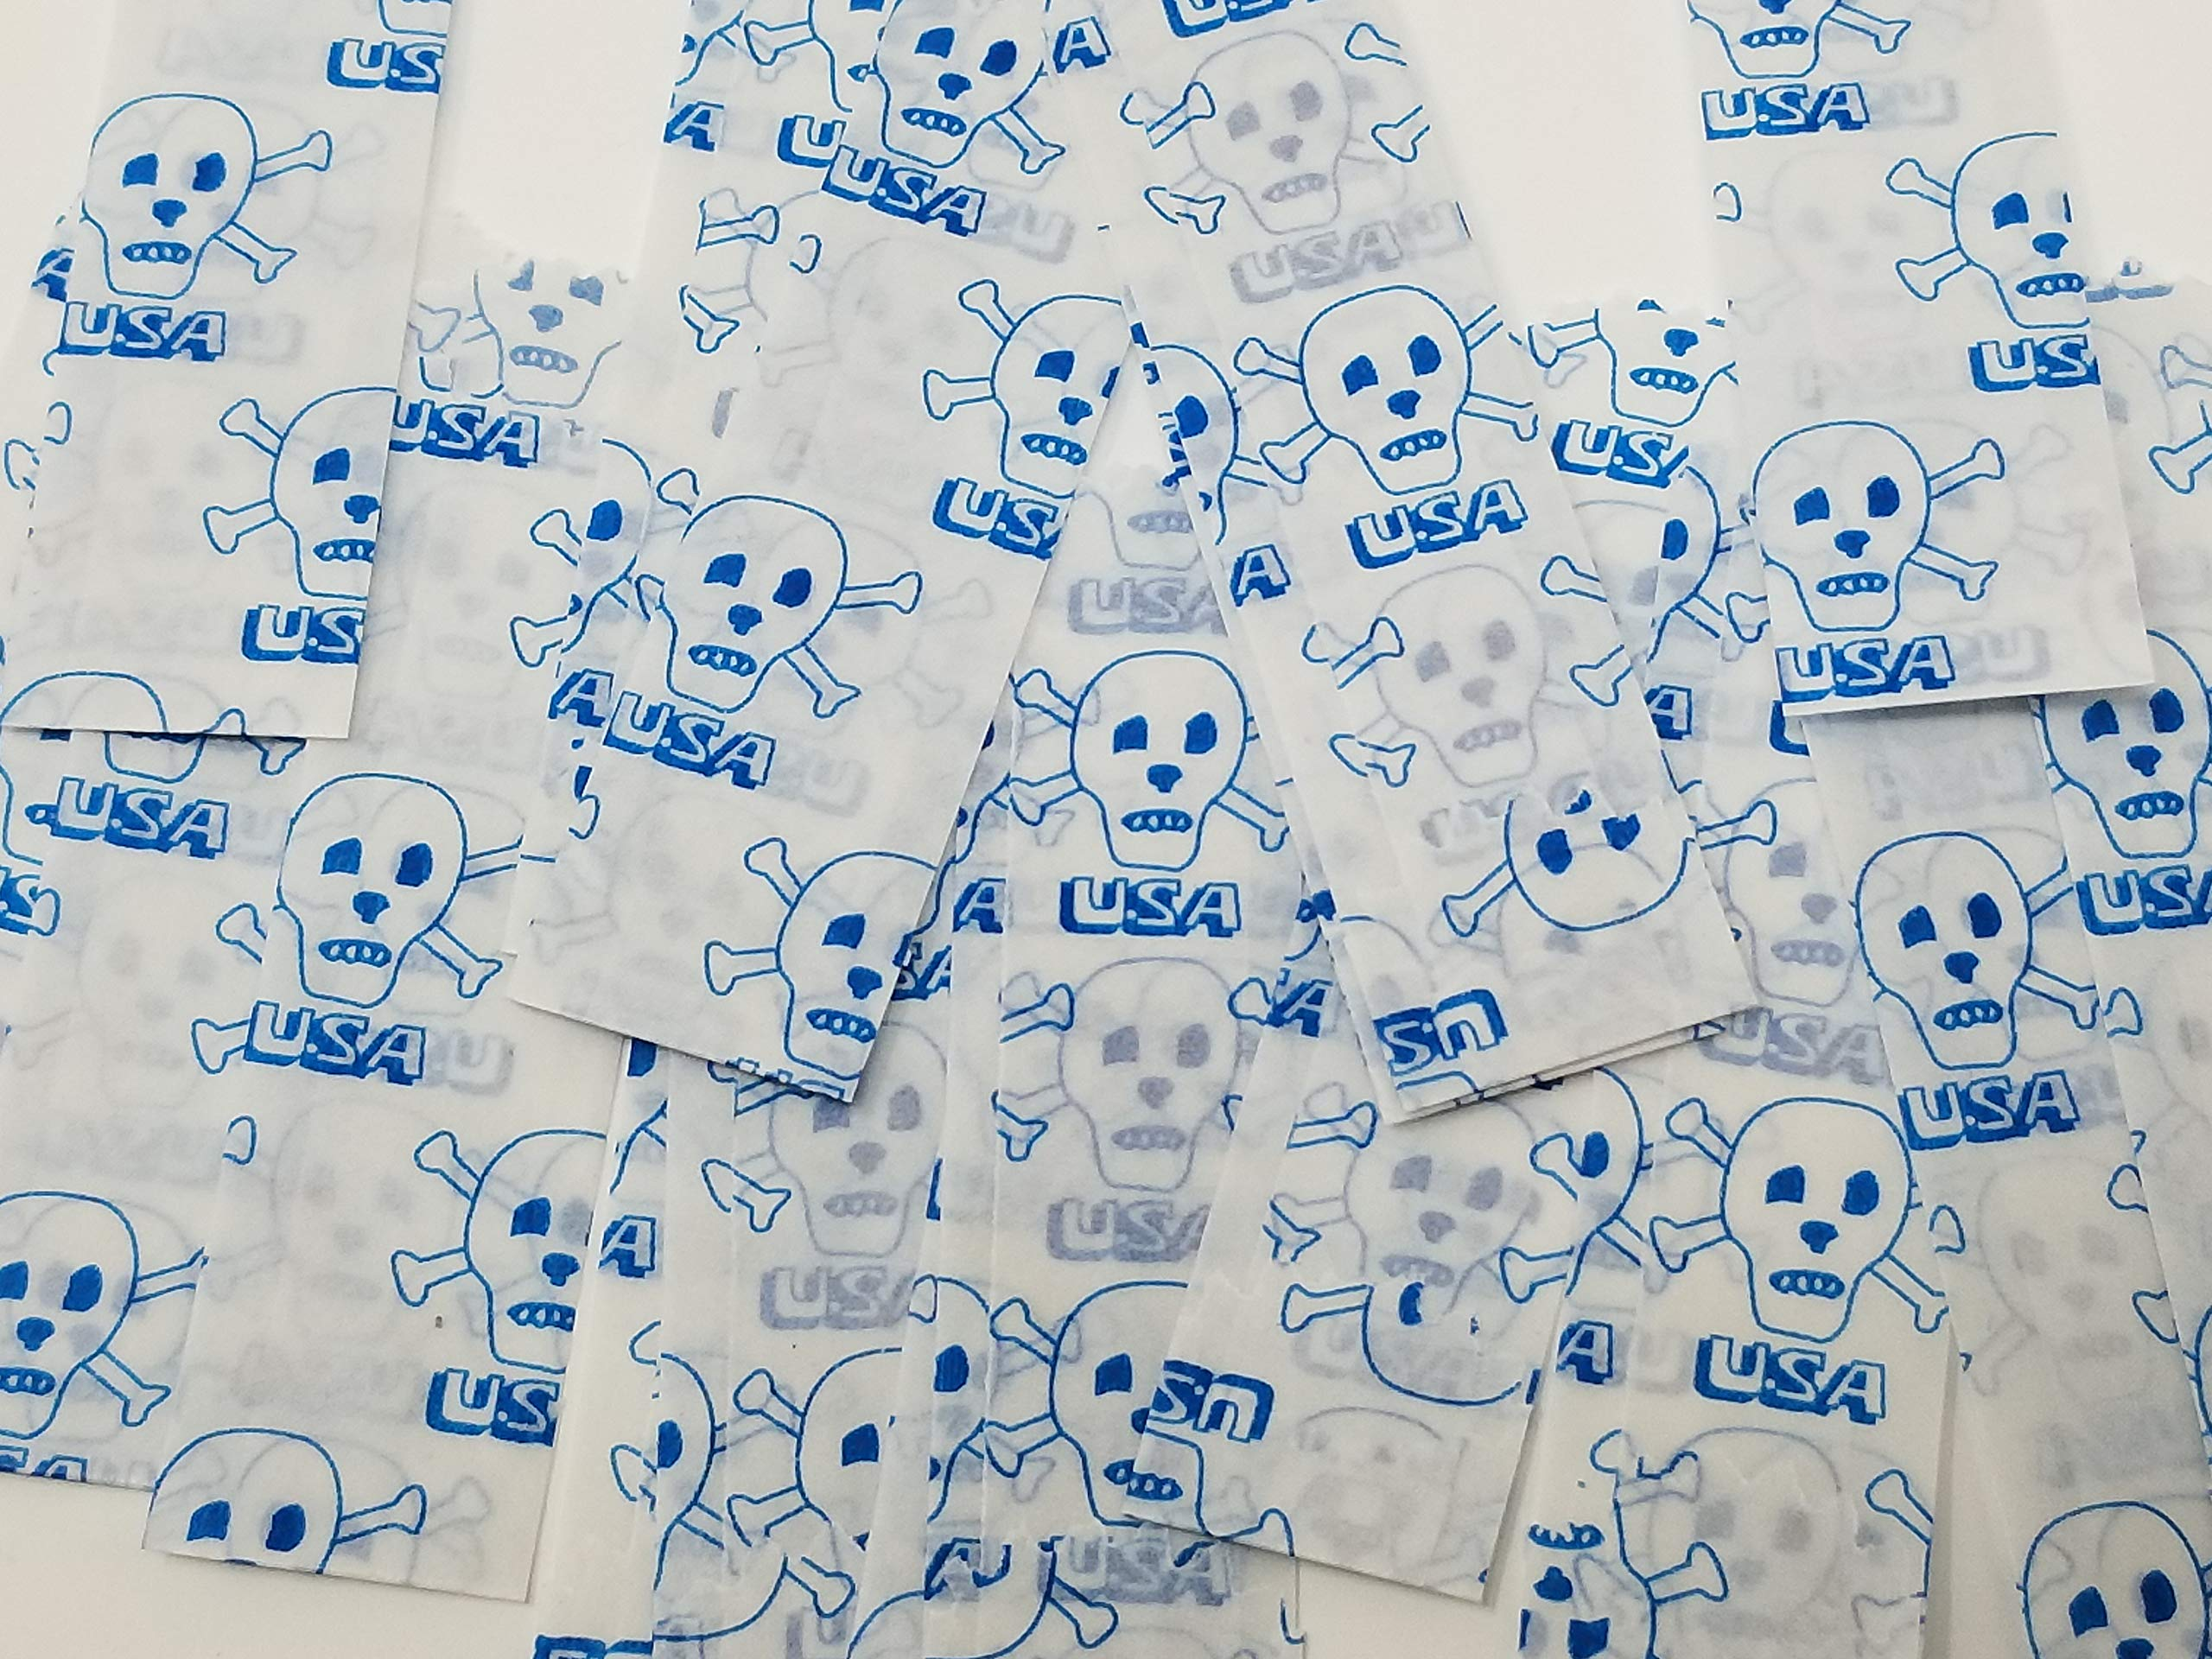 Vellum Glassine Stamp Wax Paper Envelope Bags White 100pcs 100pcs-600pcs, 20mm//22mm//25mm//27mm//32mm 27mm